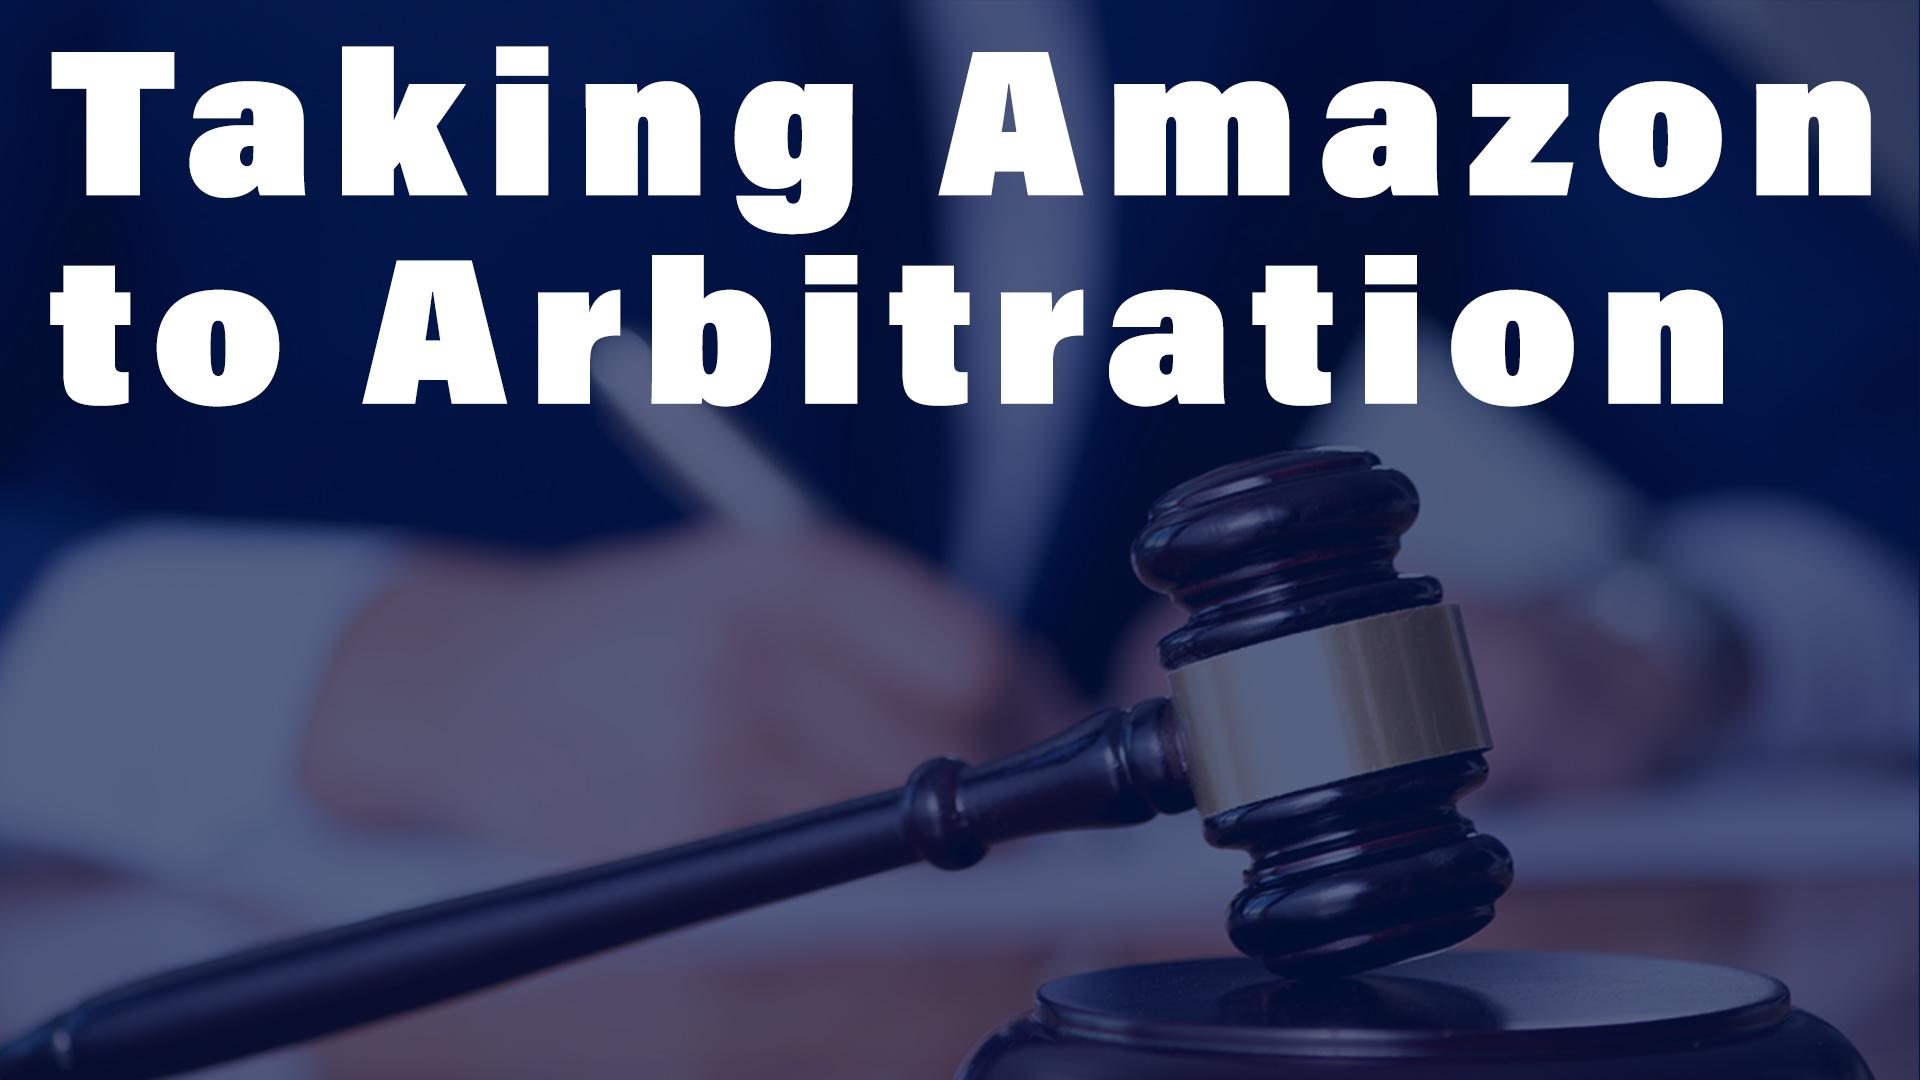 taking Amazon to arbitration